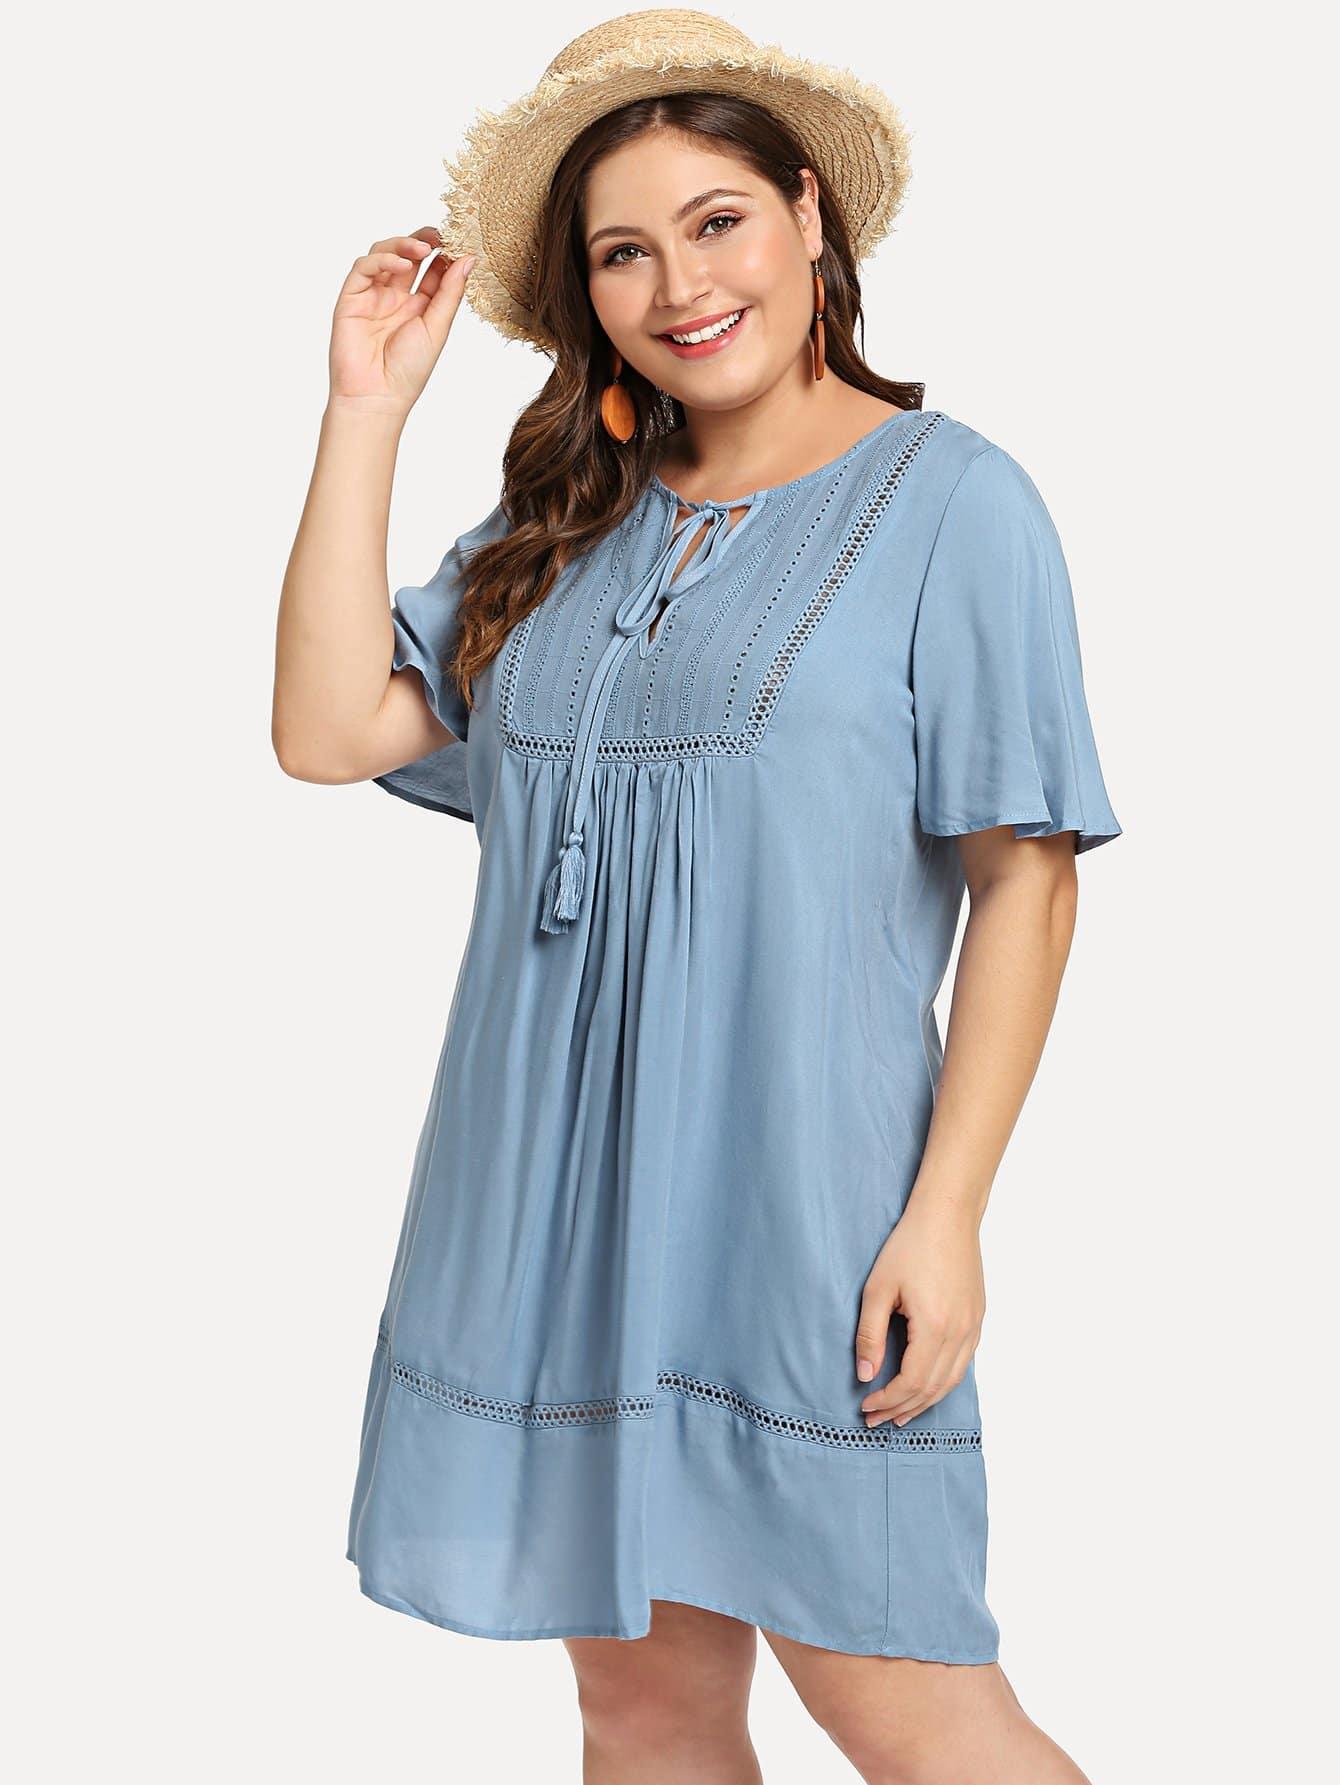 Tassel Tie Neck Lace Insert Tunic Dress